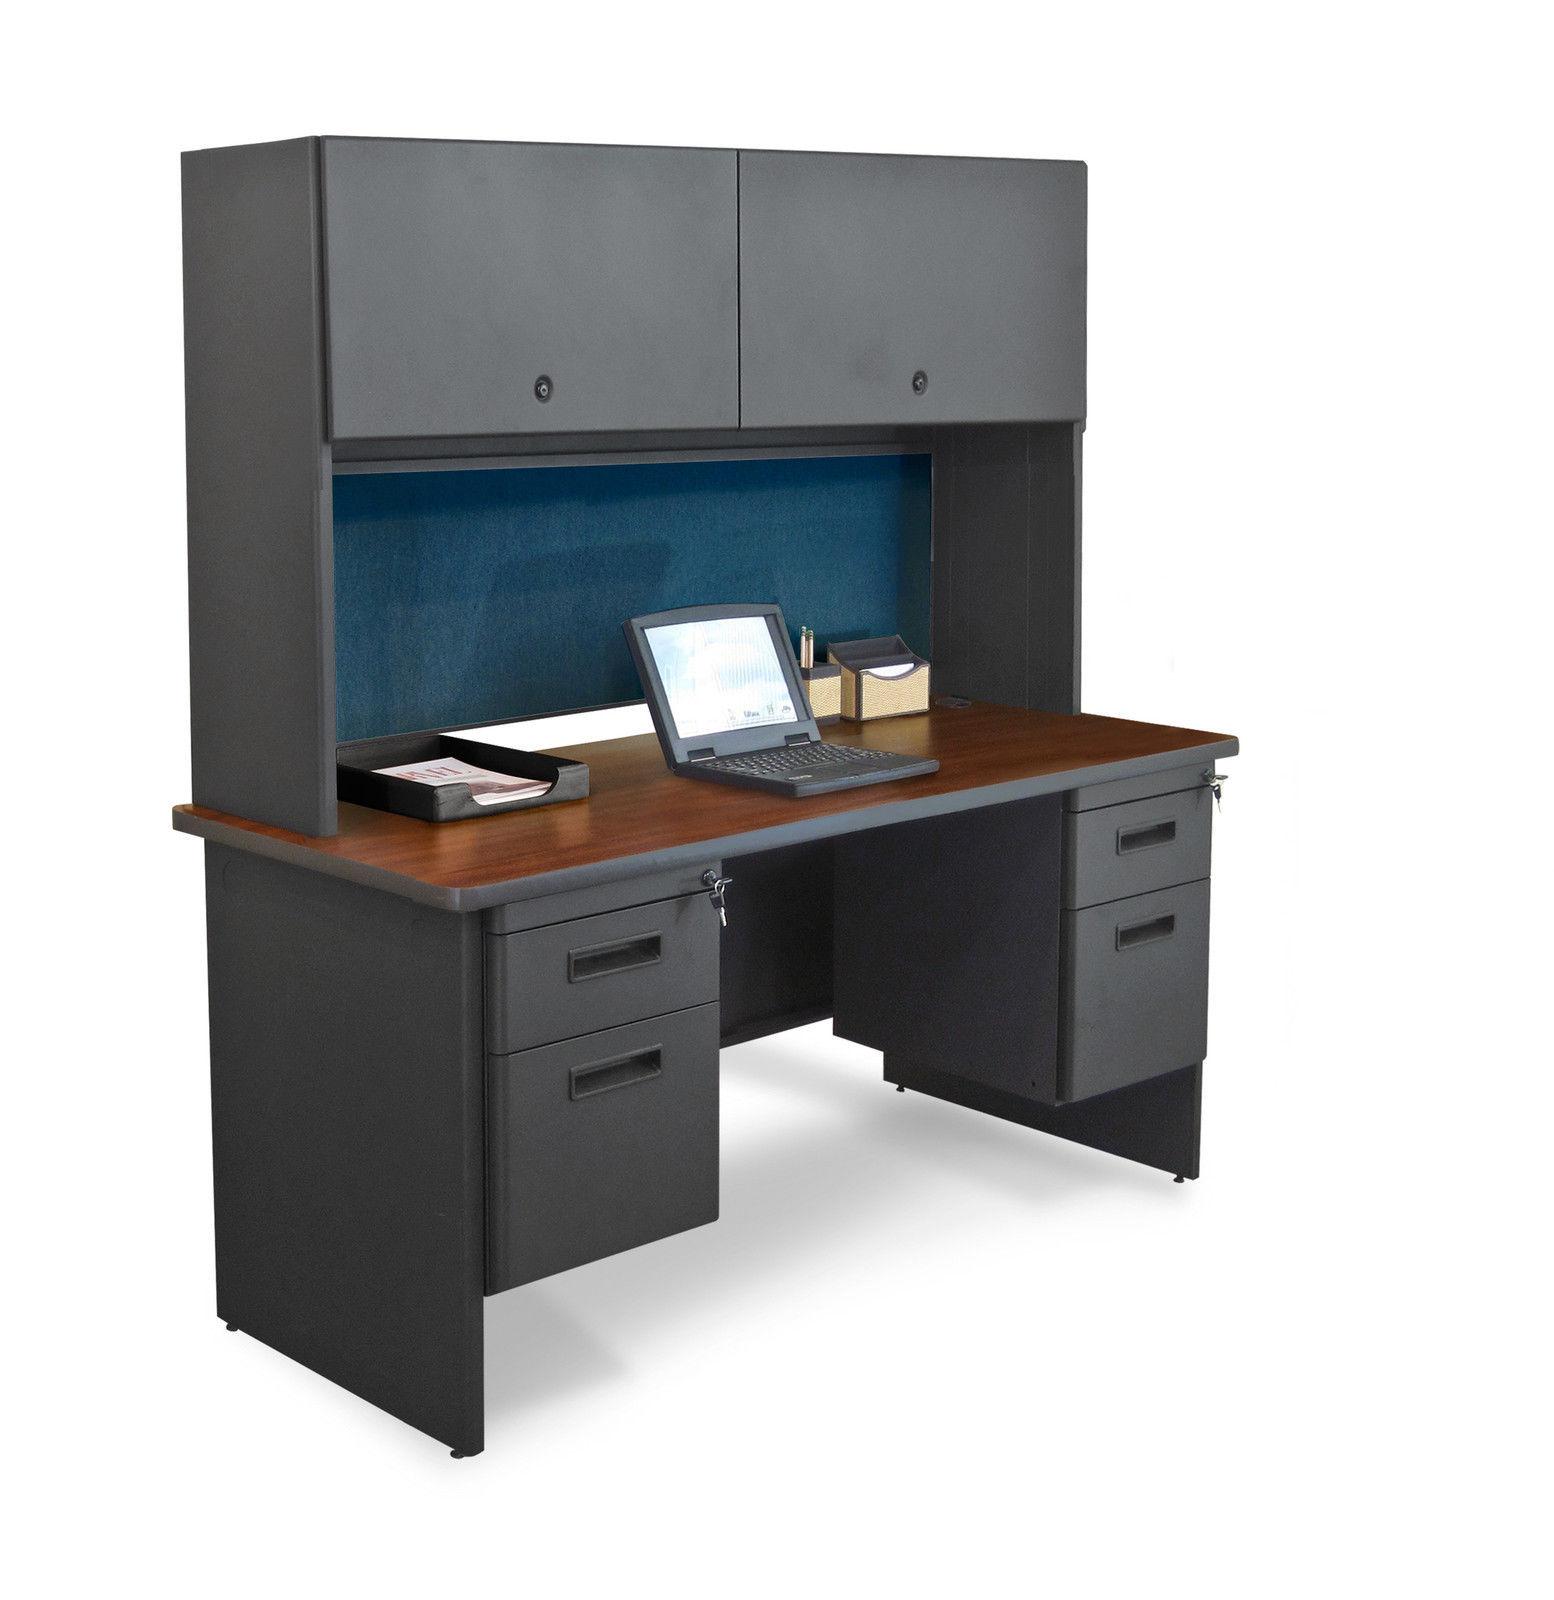 Pronto 60 Double File Desk Amp Flipper Door Cabinet 60x24